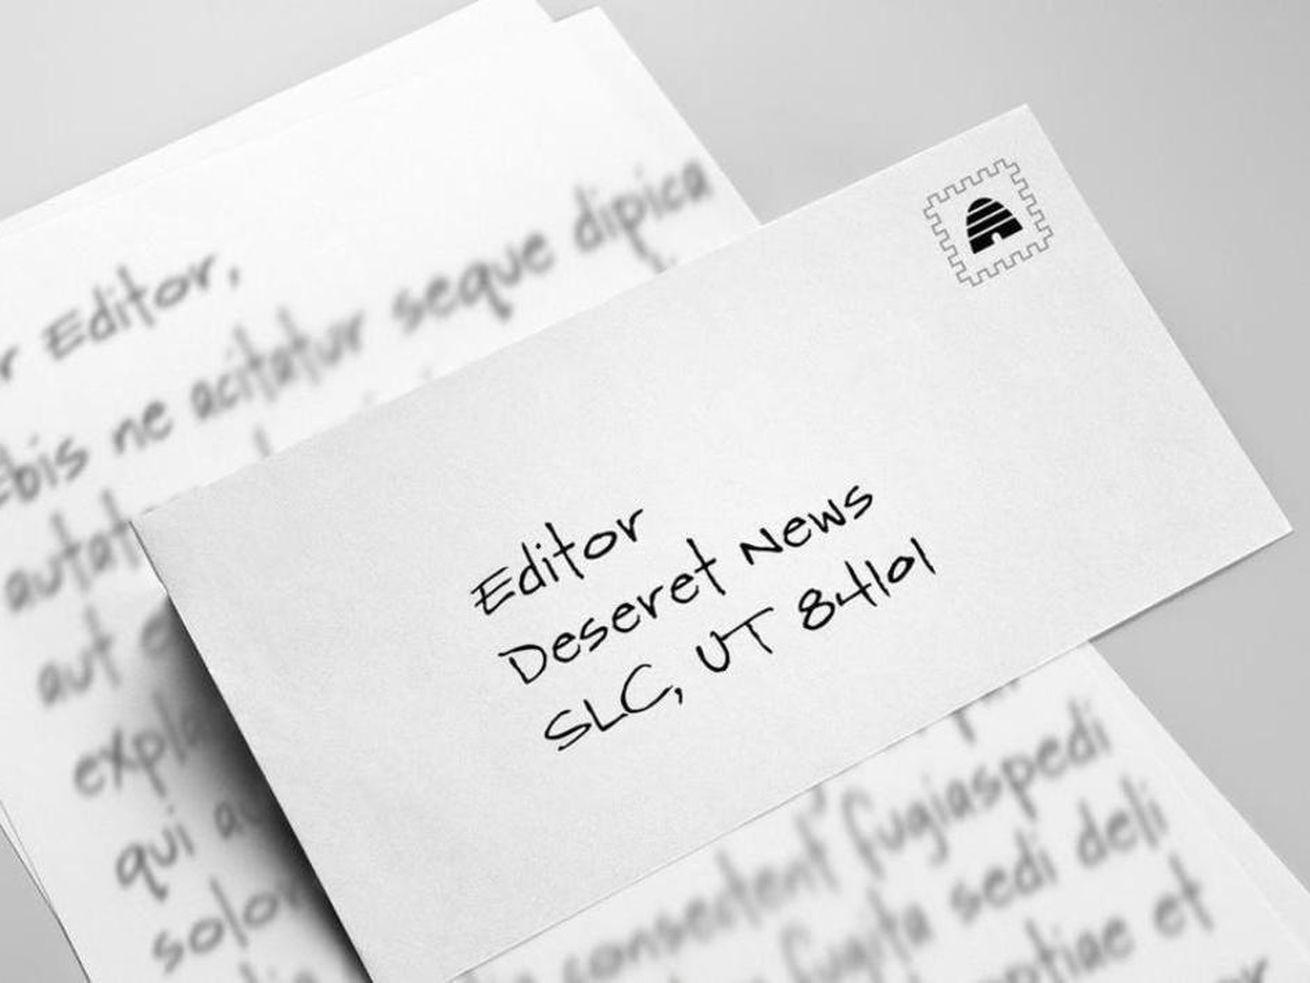 Letter: An obvious burger bias